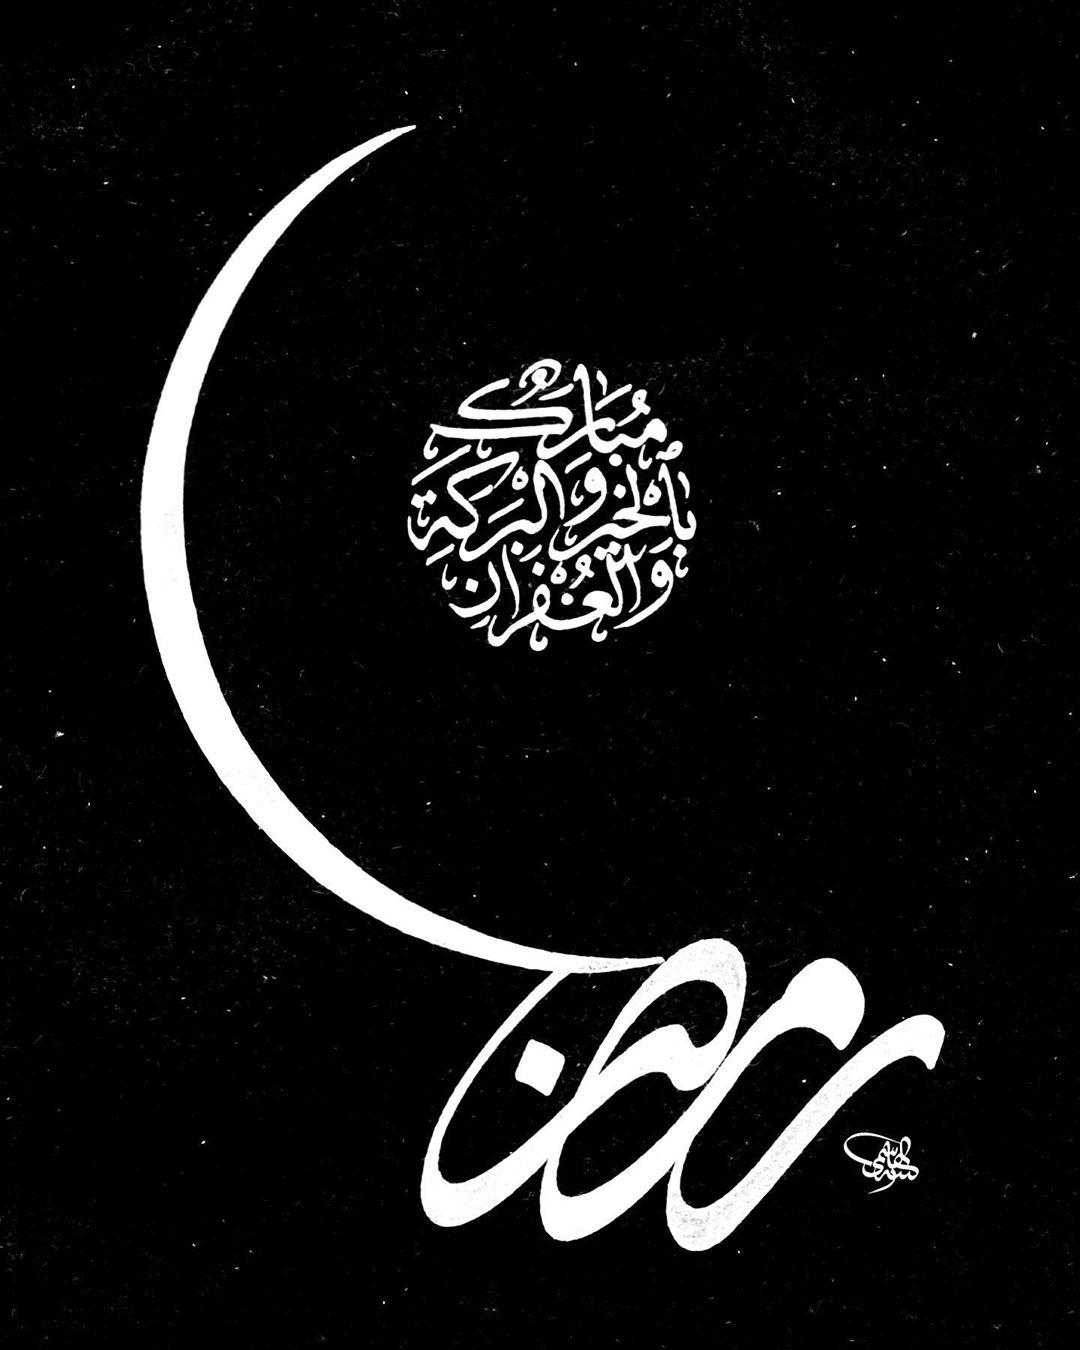 Khat Diwani Ajhalawani/Amr رمضان مبارك عليكم أحبتي جميعا... 1780 2